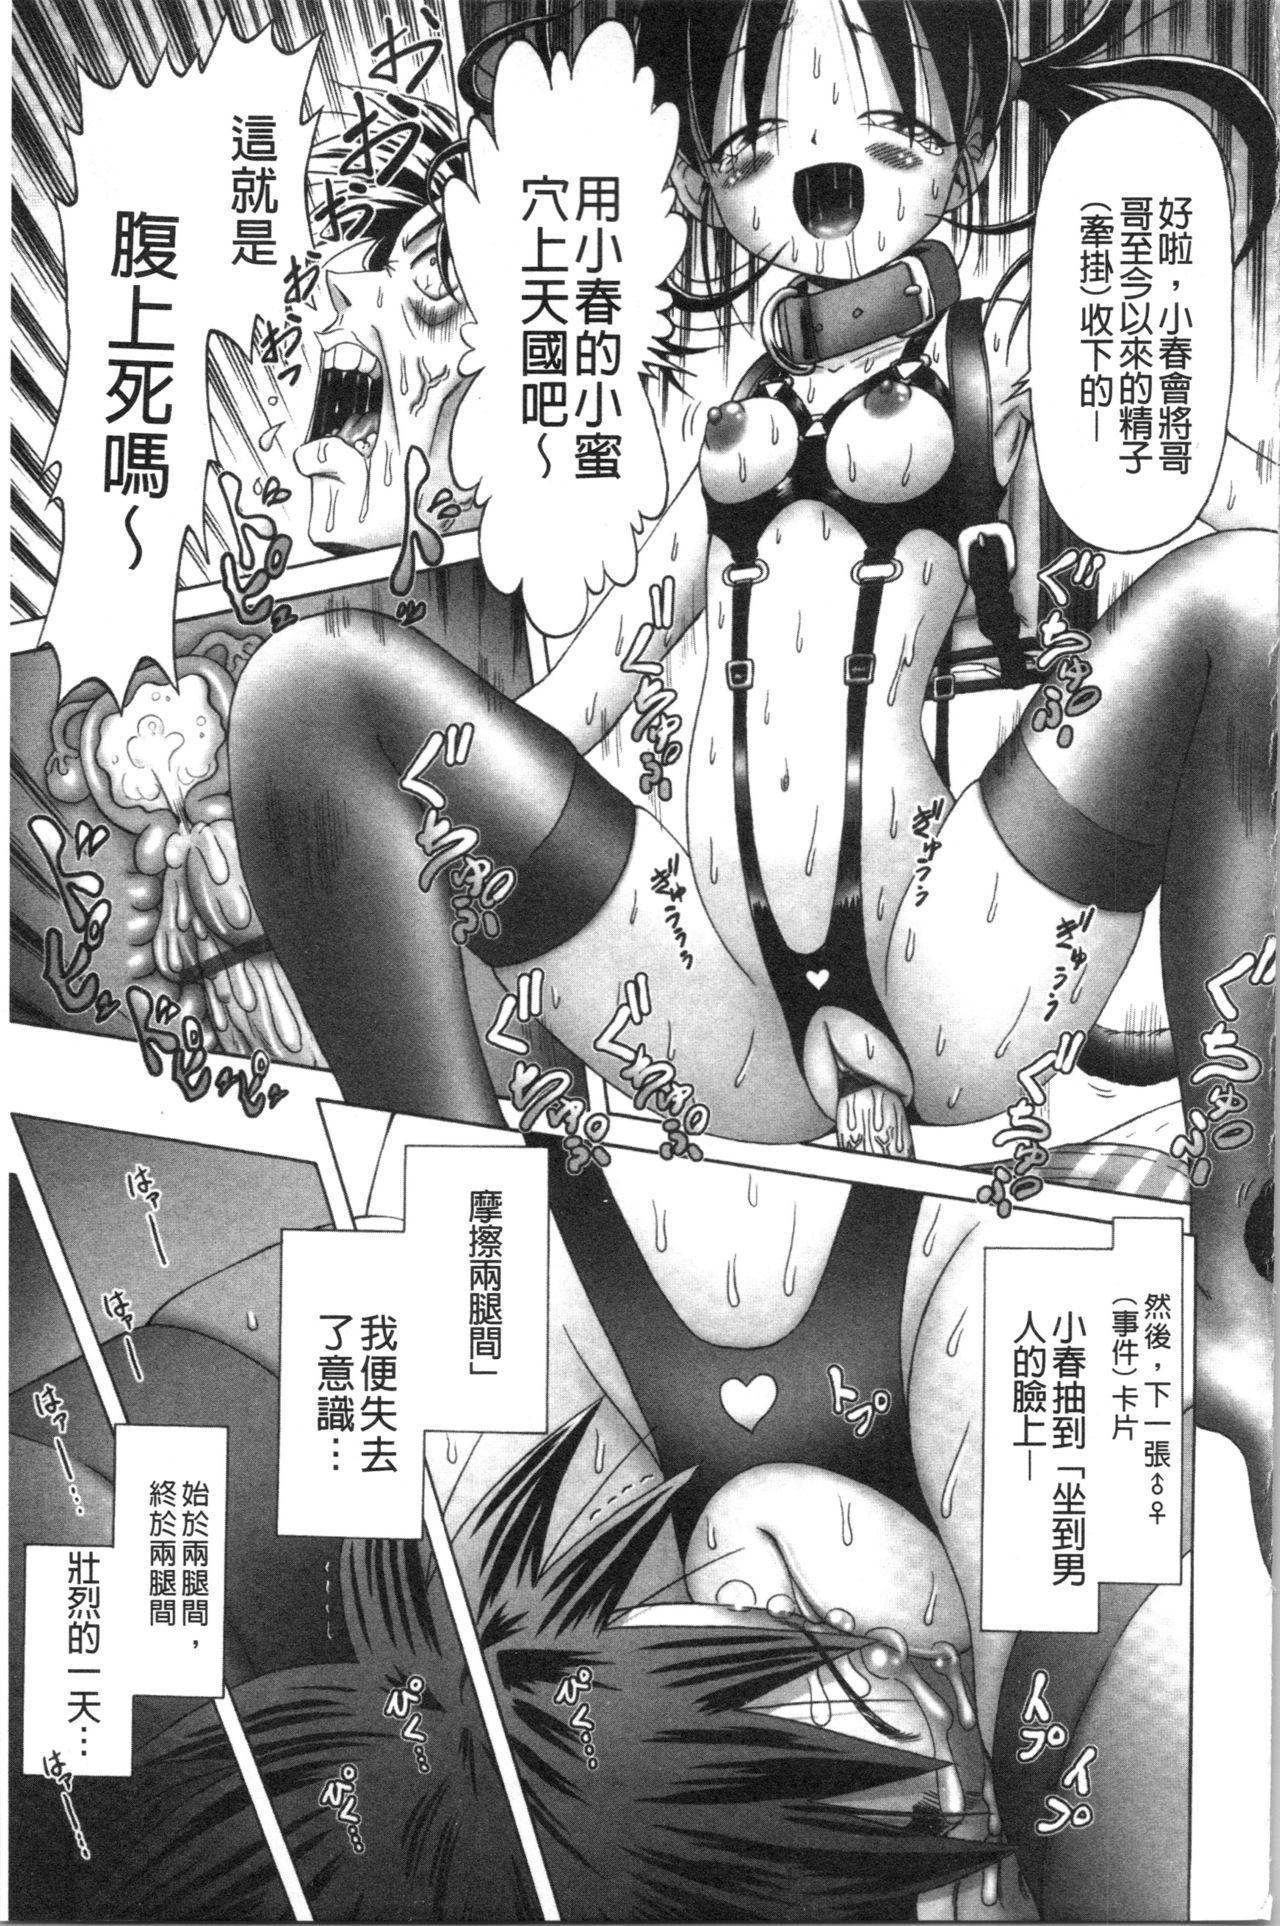 Yousei Settai - Aiyoku no Yukemuri Ryojou | 幼性接待 愛欲的溫泉湯煙旅情 134